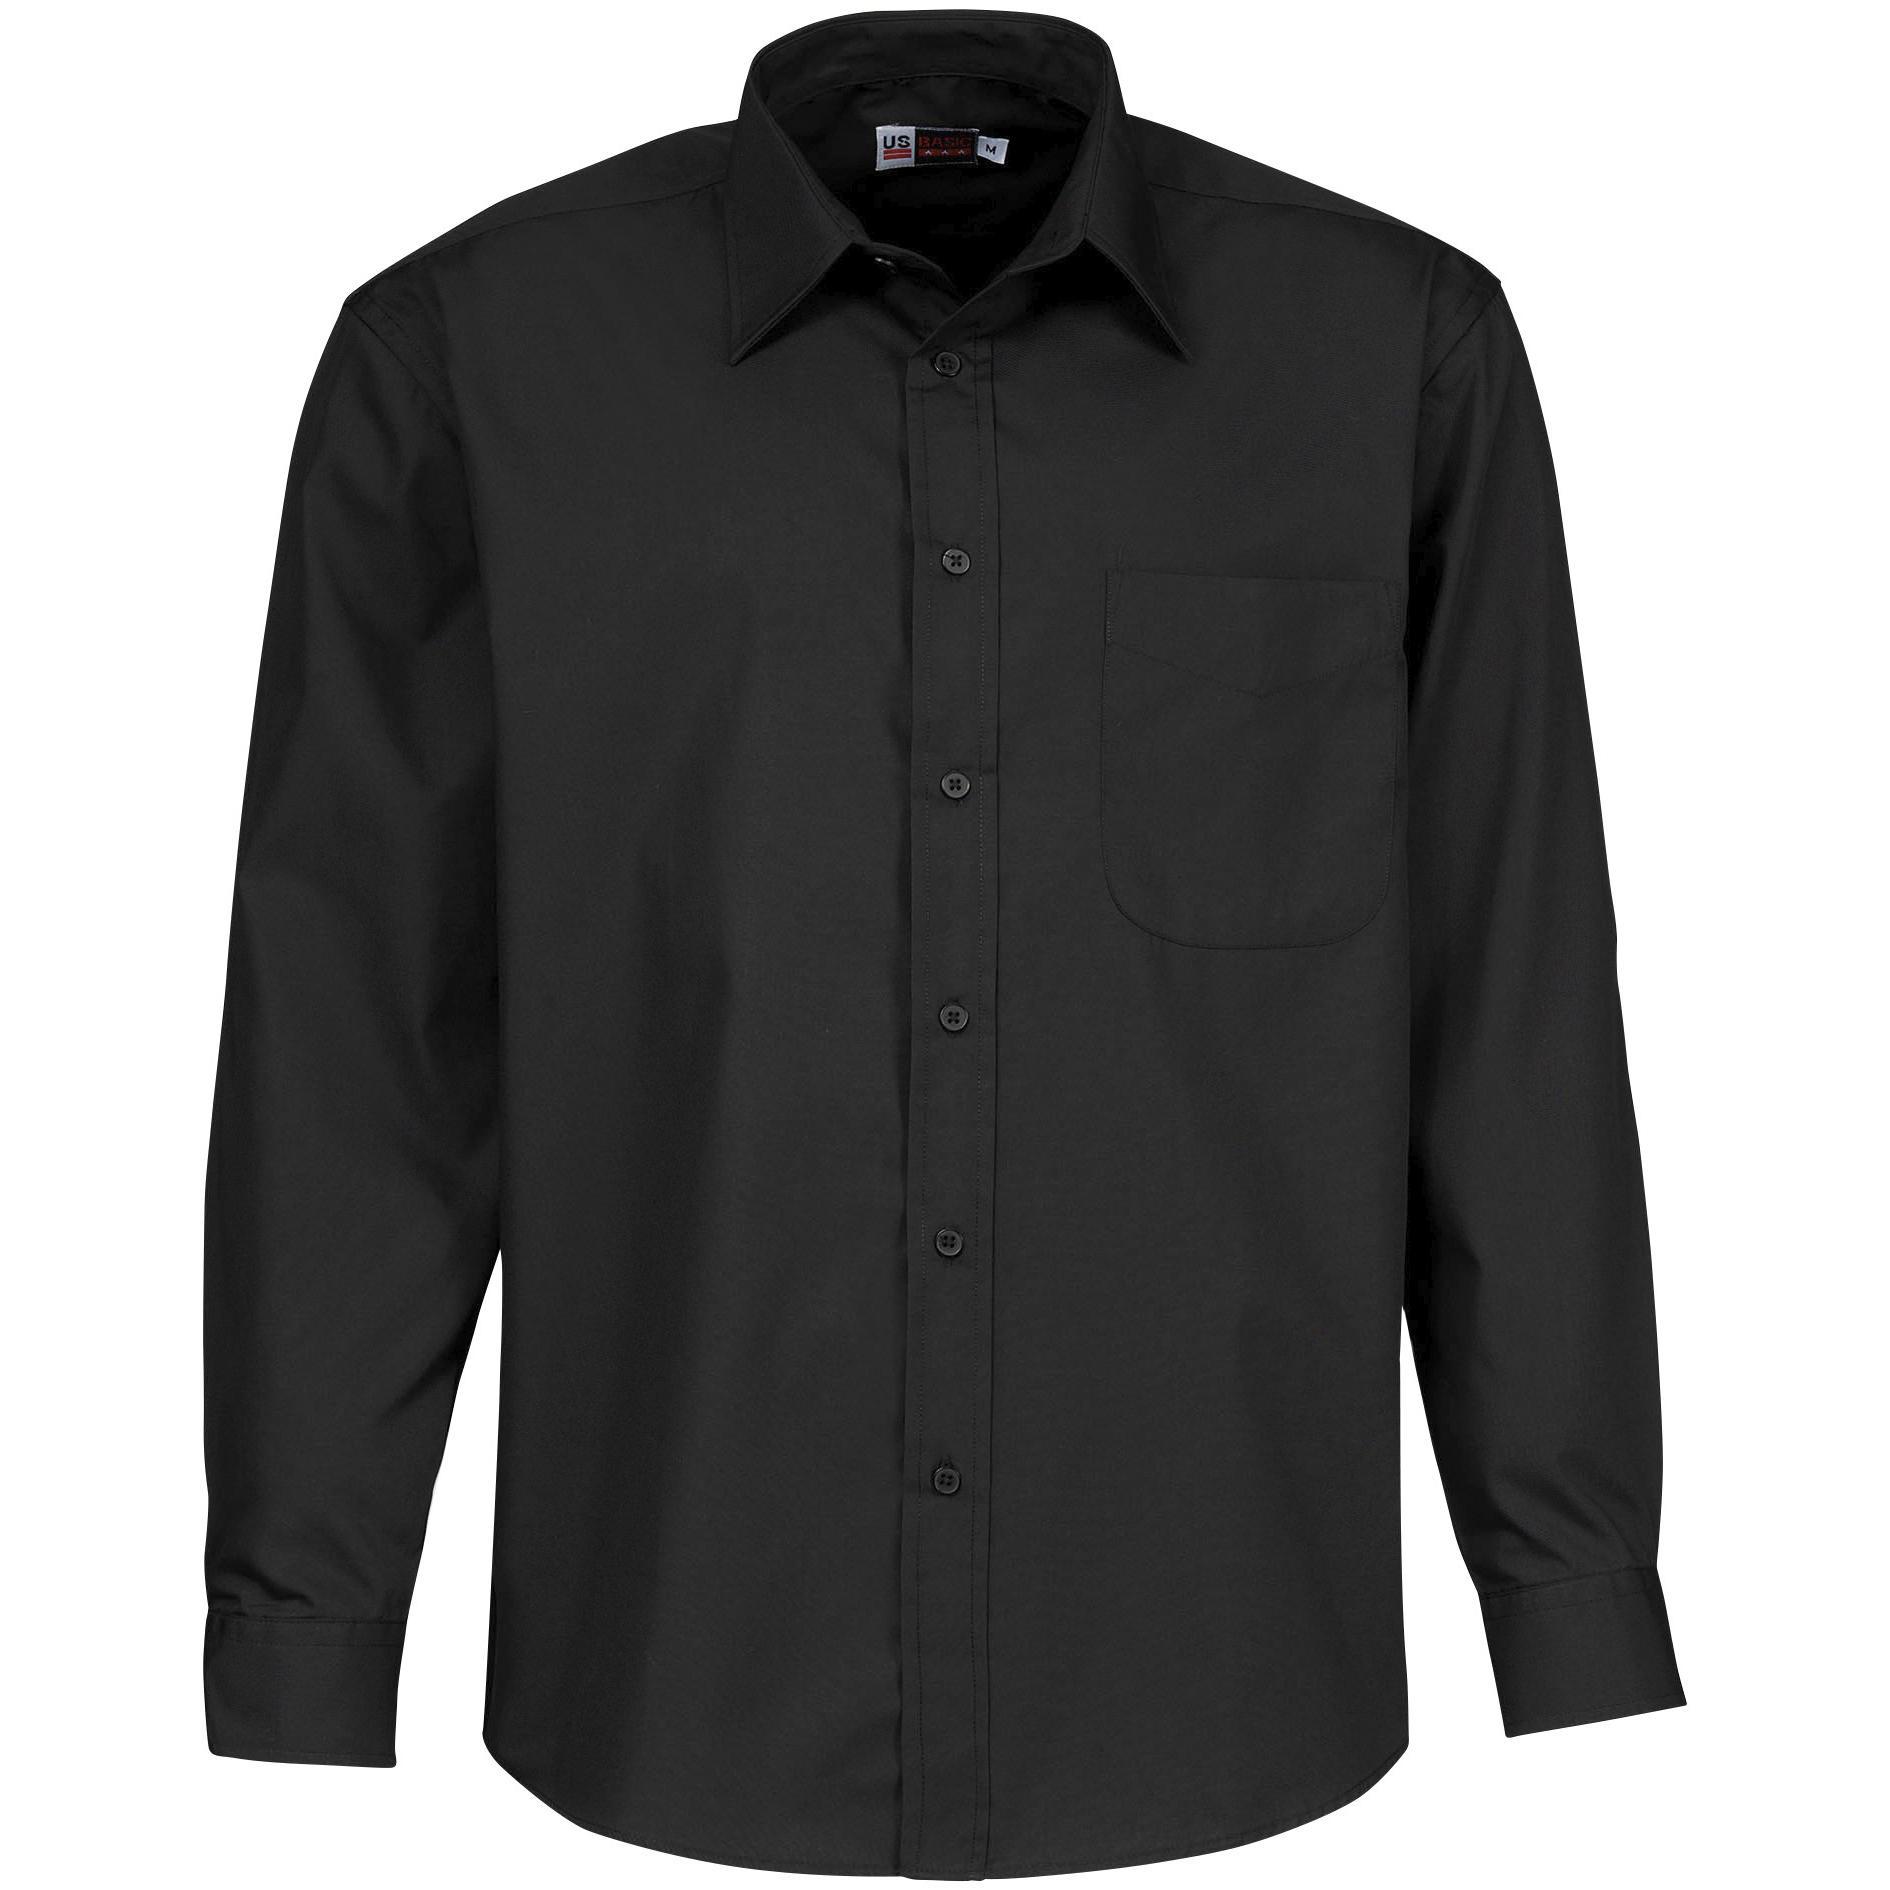 Mens Long Sleeve Washington Shirt - Black Only